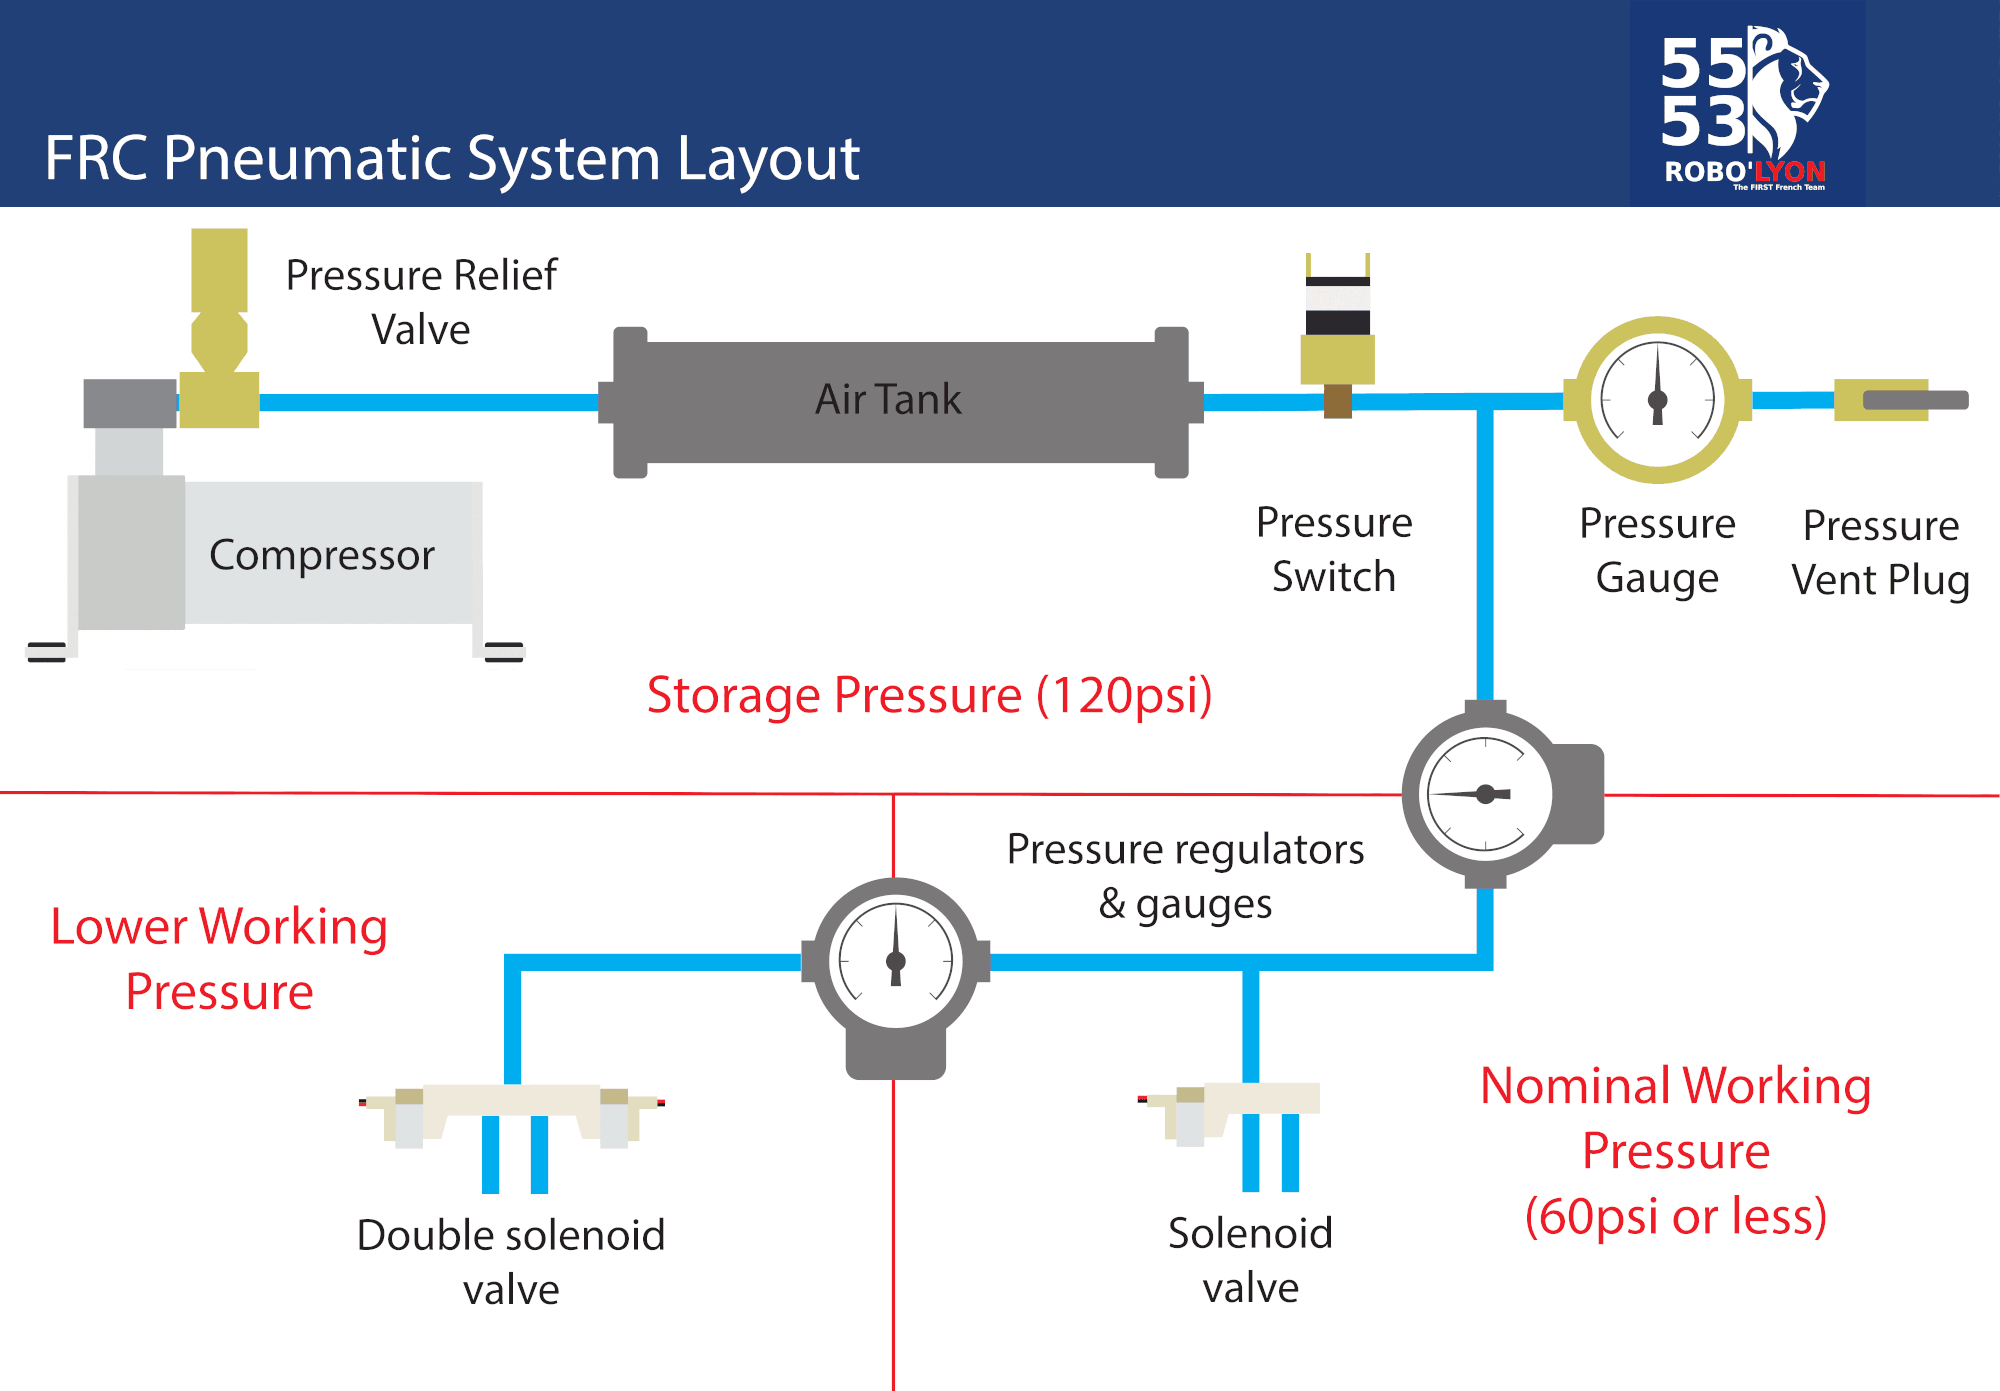 FRC Pneumatic System Diagram - Control System - Chief Delphi on